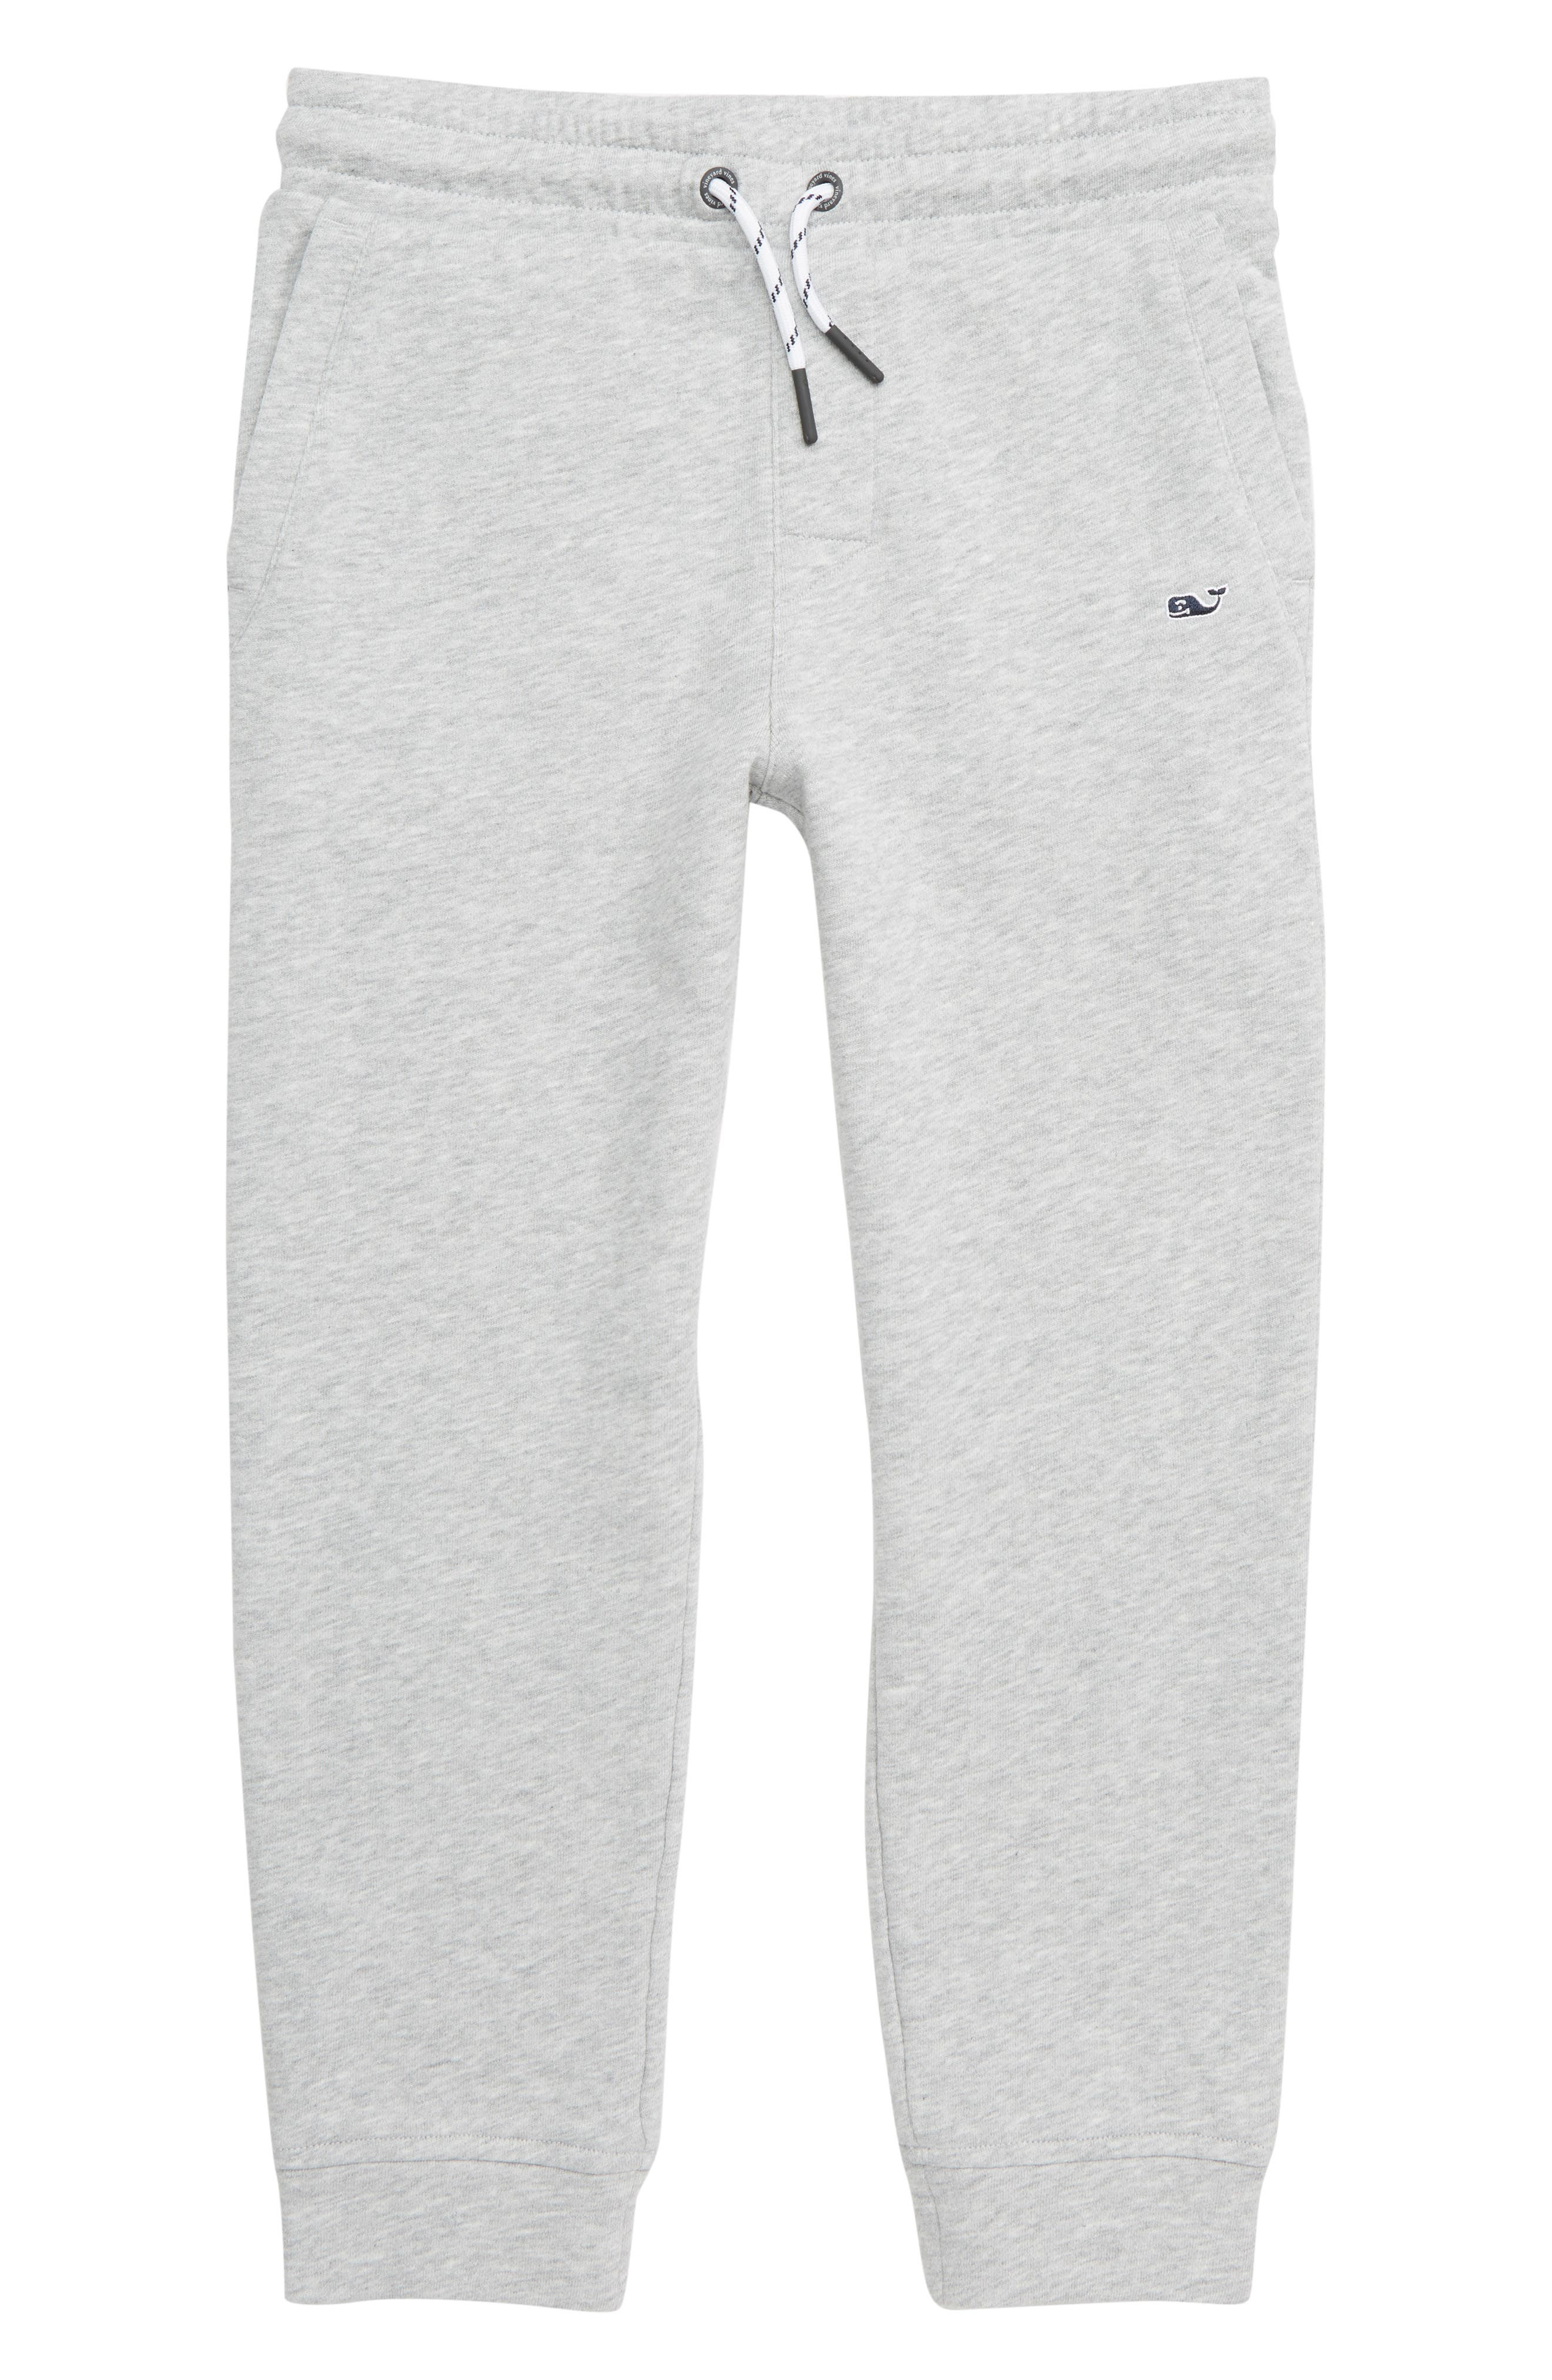 VINEYARD VINES Go Knit Jogger Sweatpants, Main, color, MEDIUM HEATHER GRAY